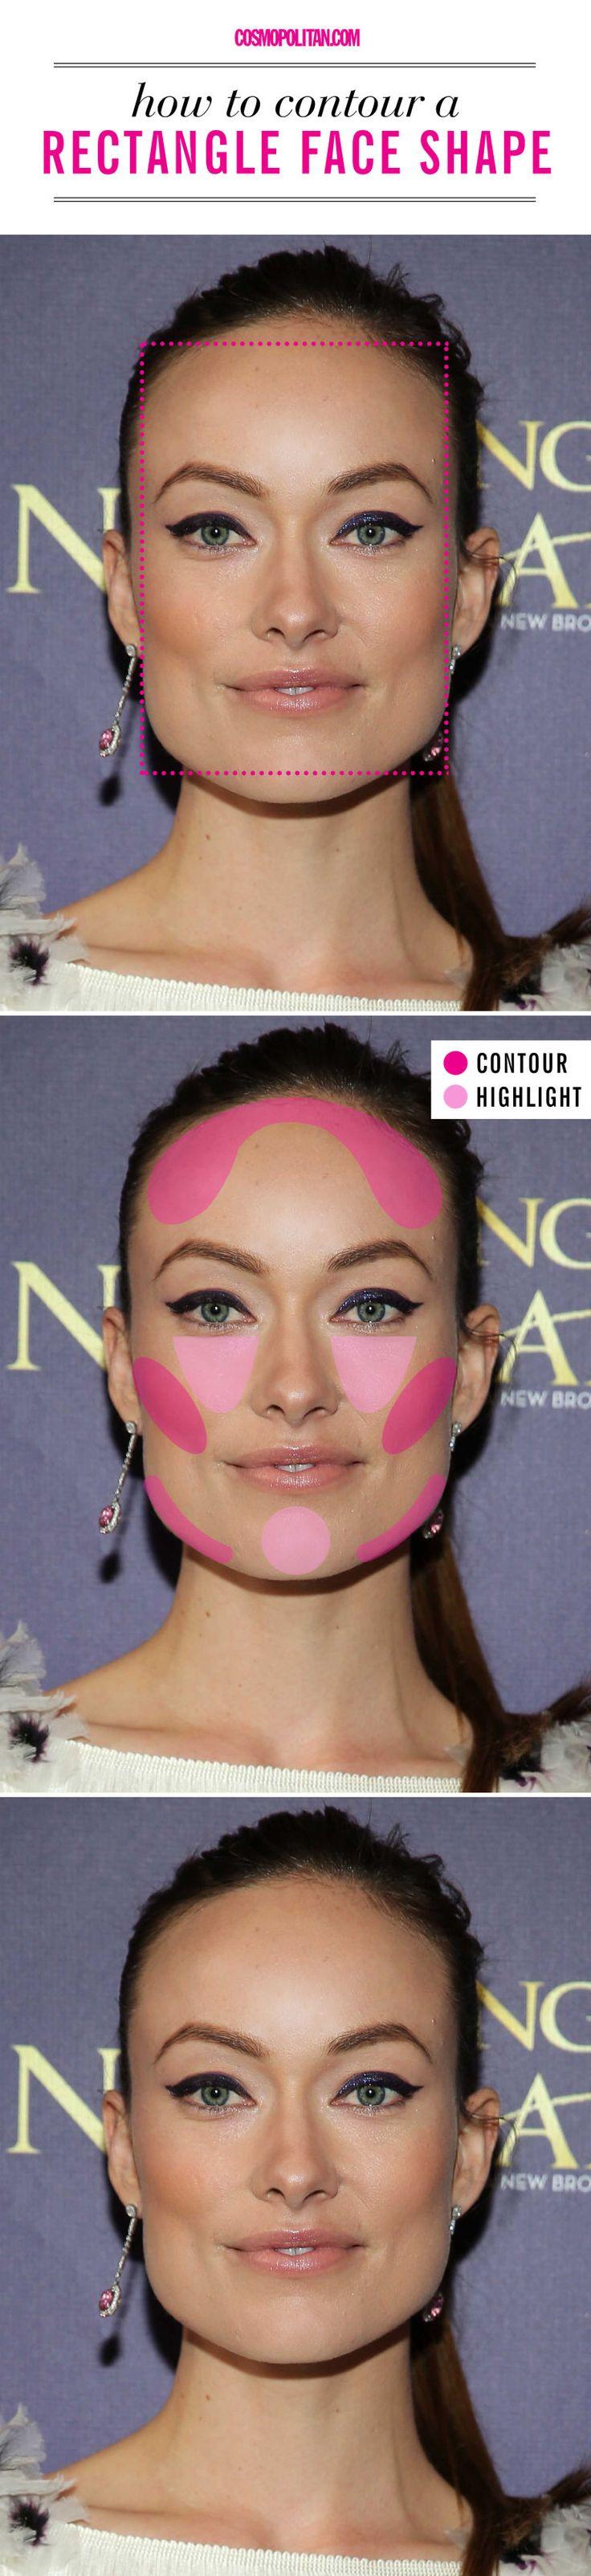 Best 25+ Rectangle face shape ideas on Pinterest